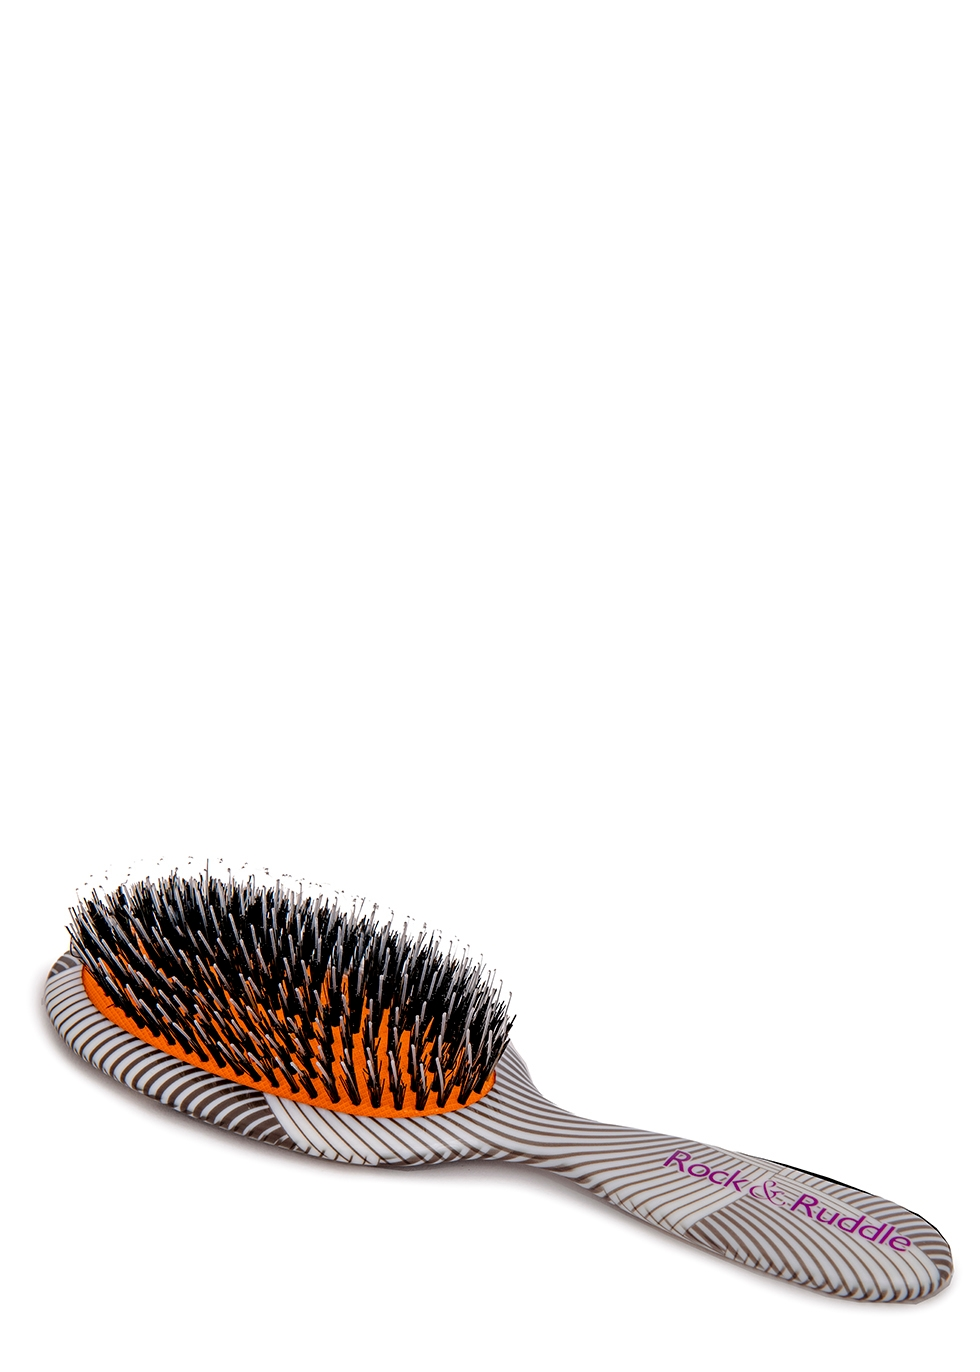 Large Bristle Brush - Swirl